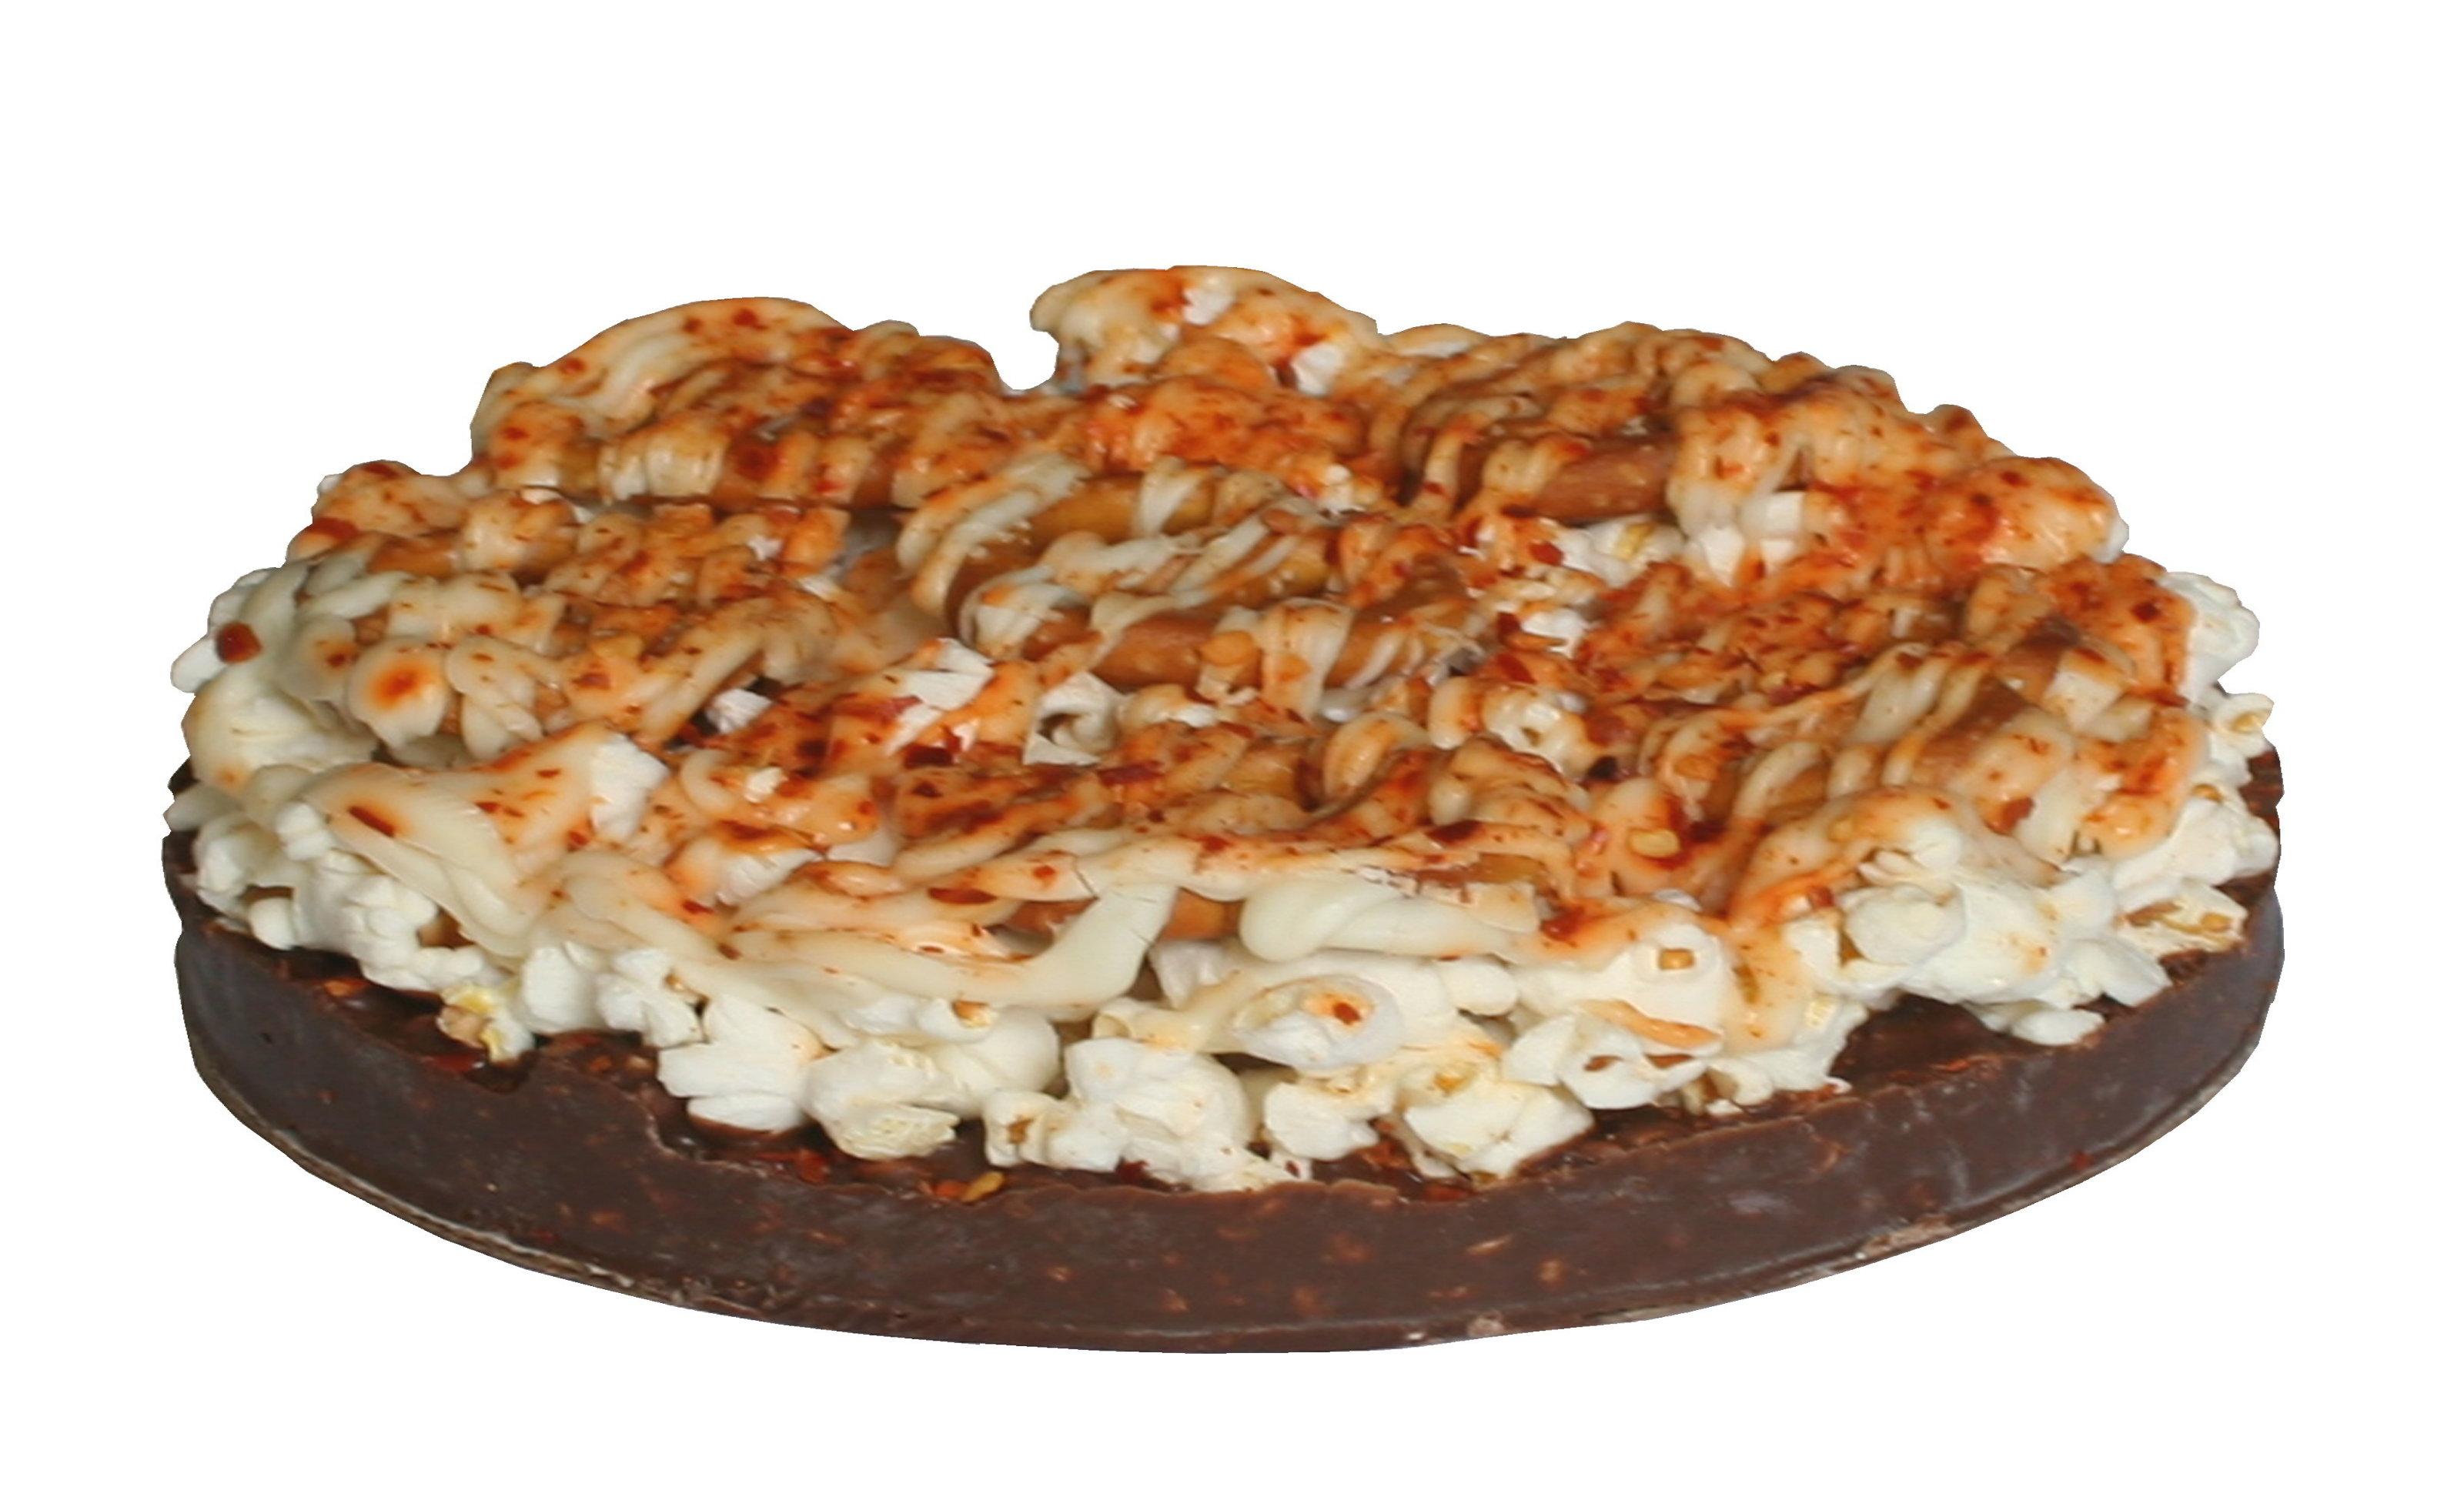 Gourmet Chocolate Pizza - Pizazz™ - Hot - Wholesale W-PZDH